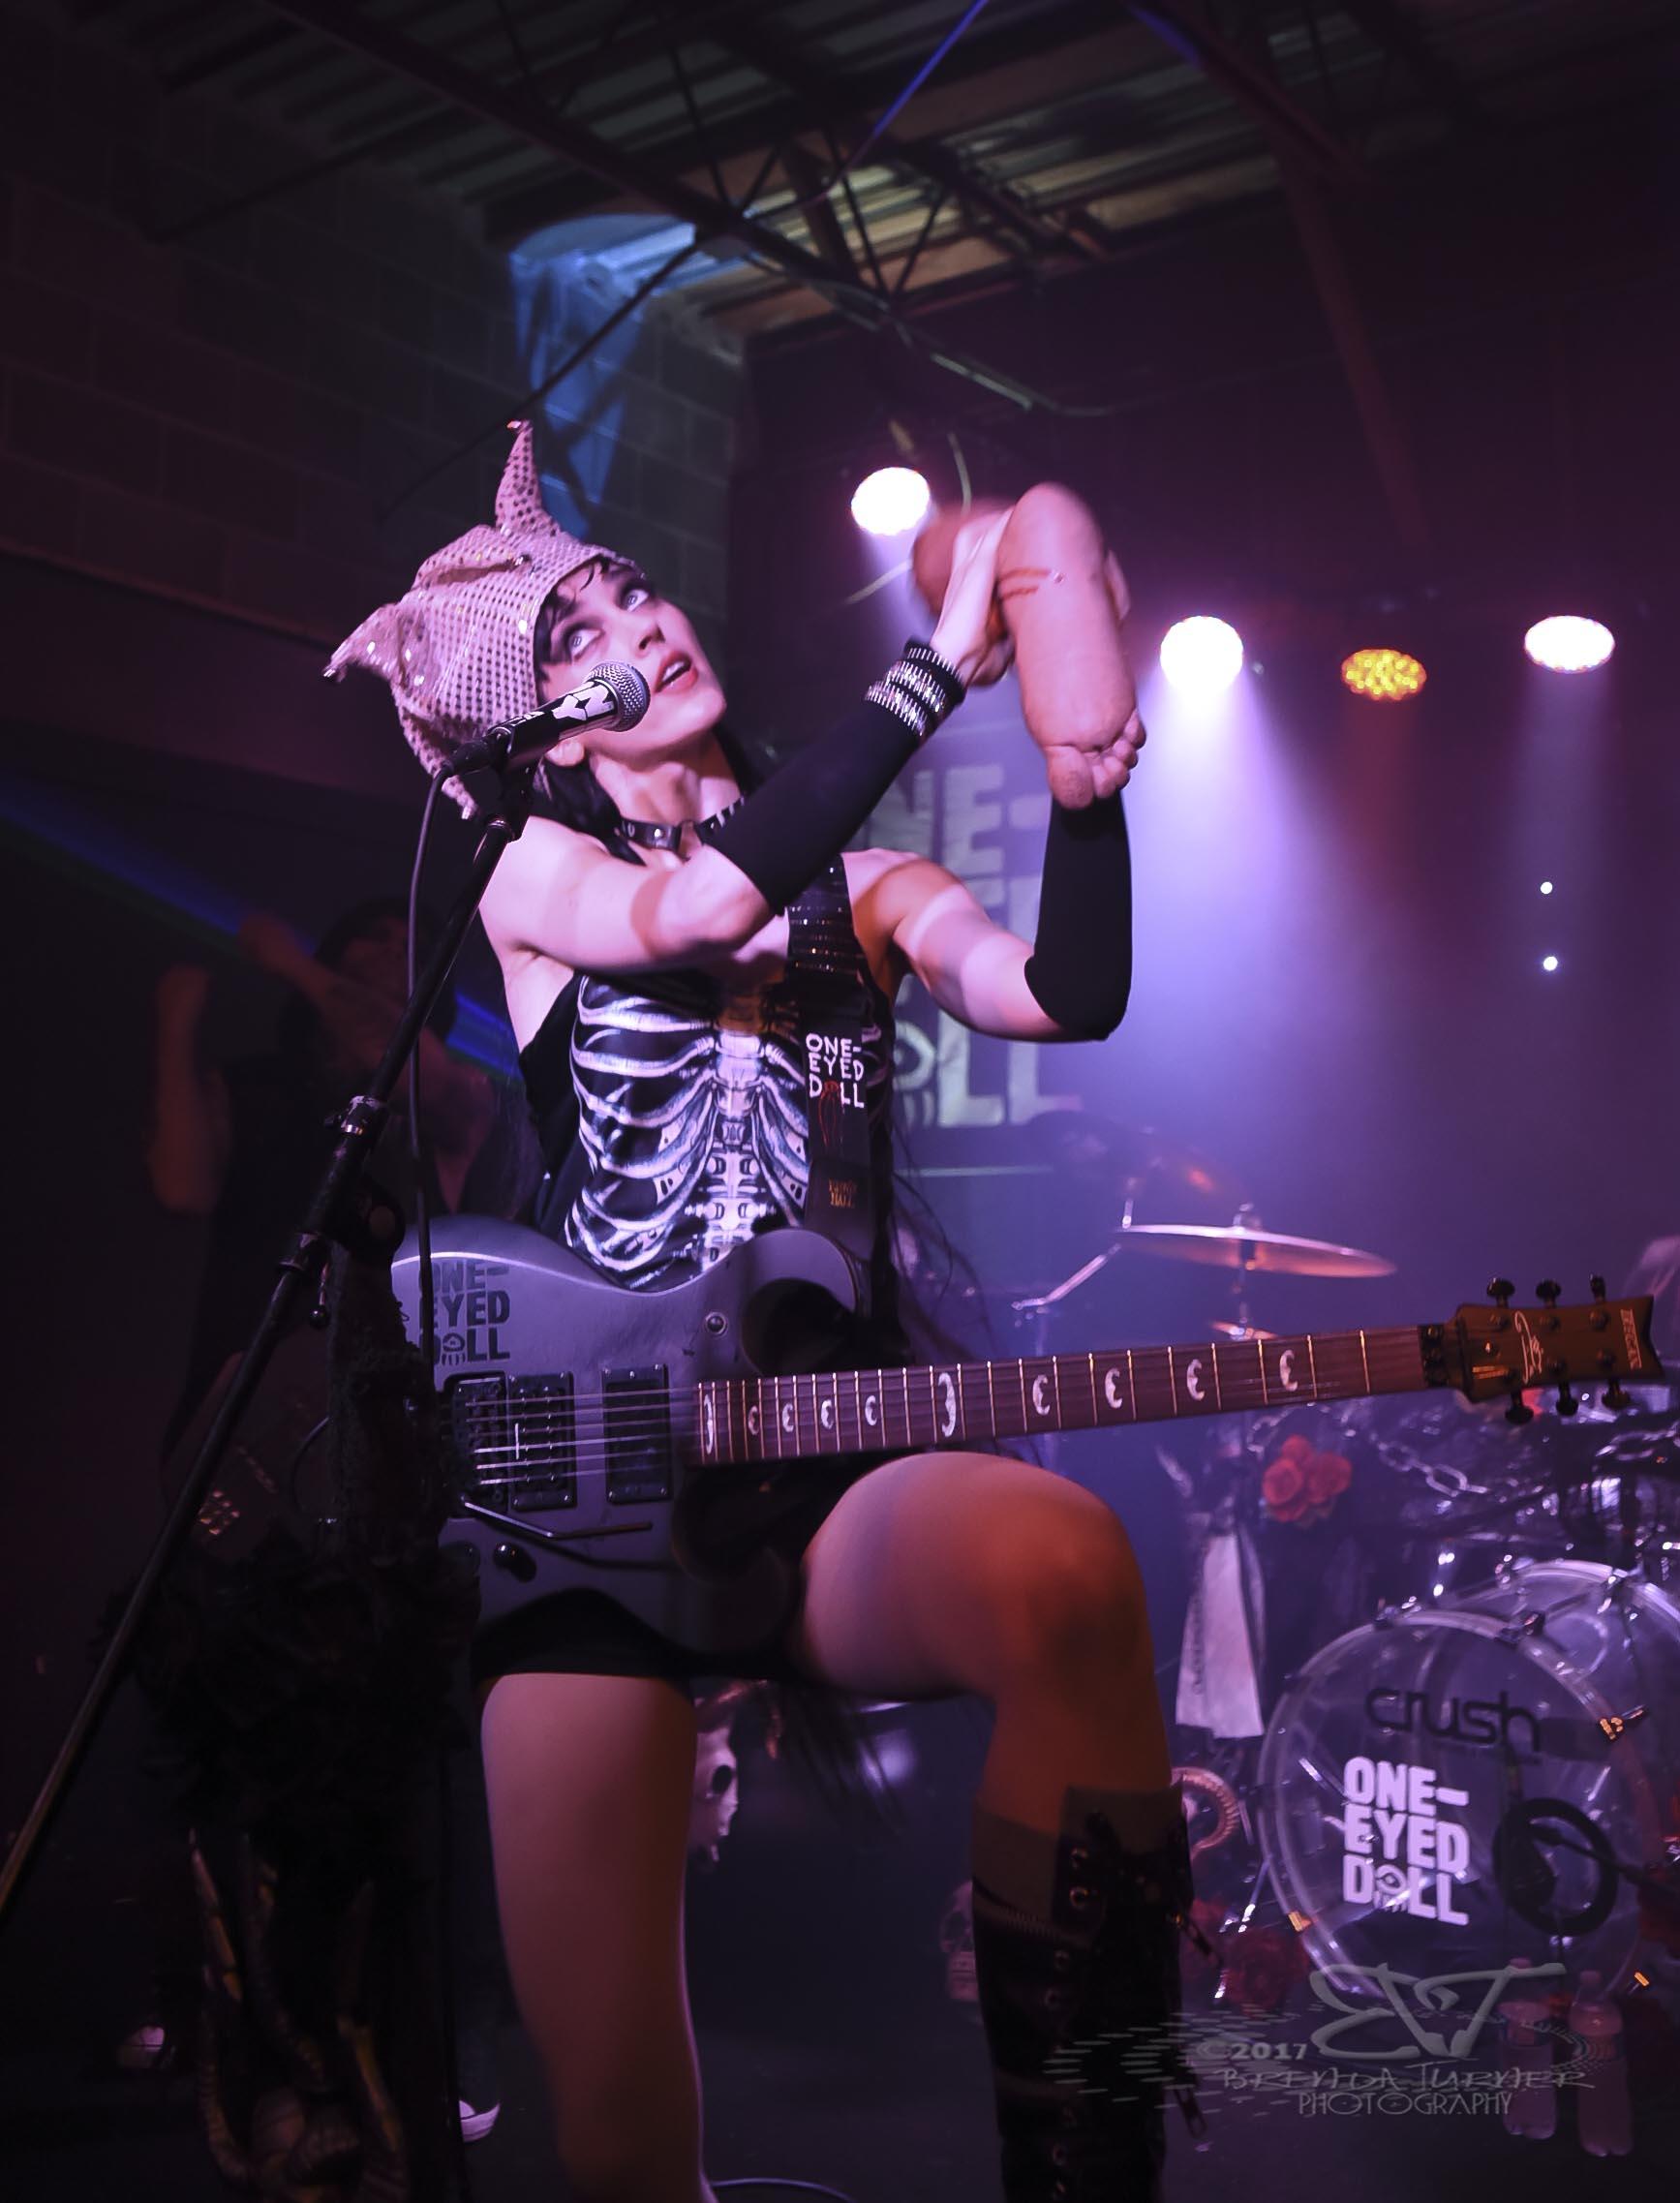 OneEyed Doll 13